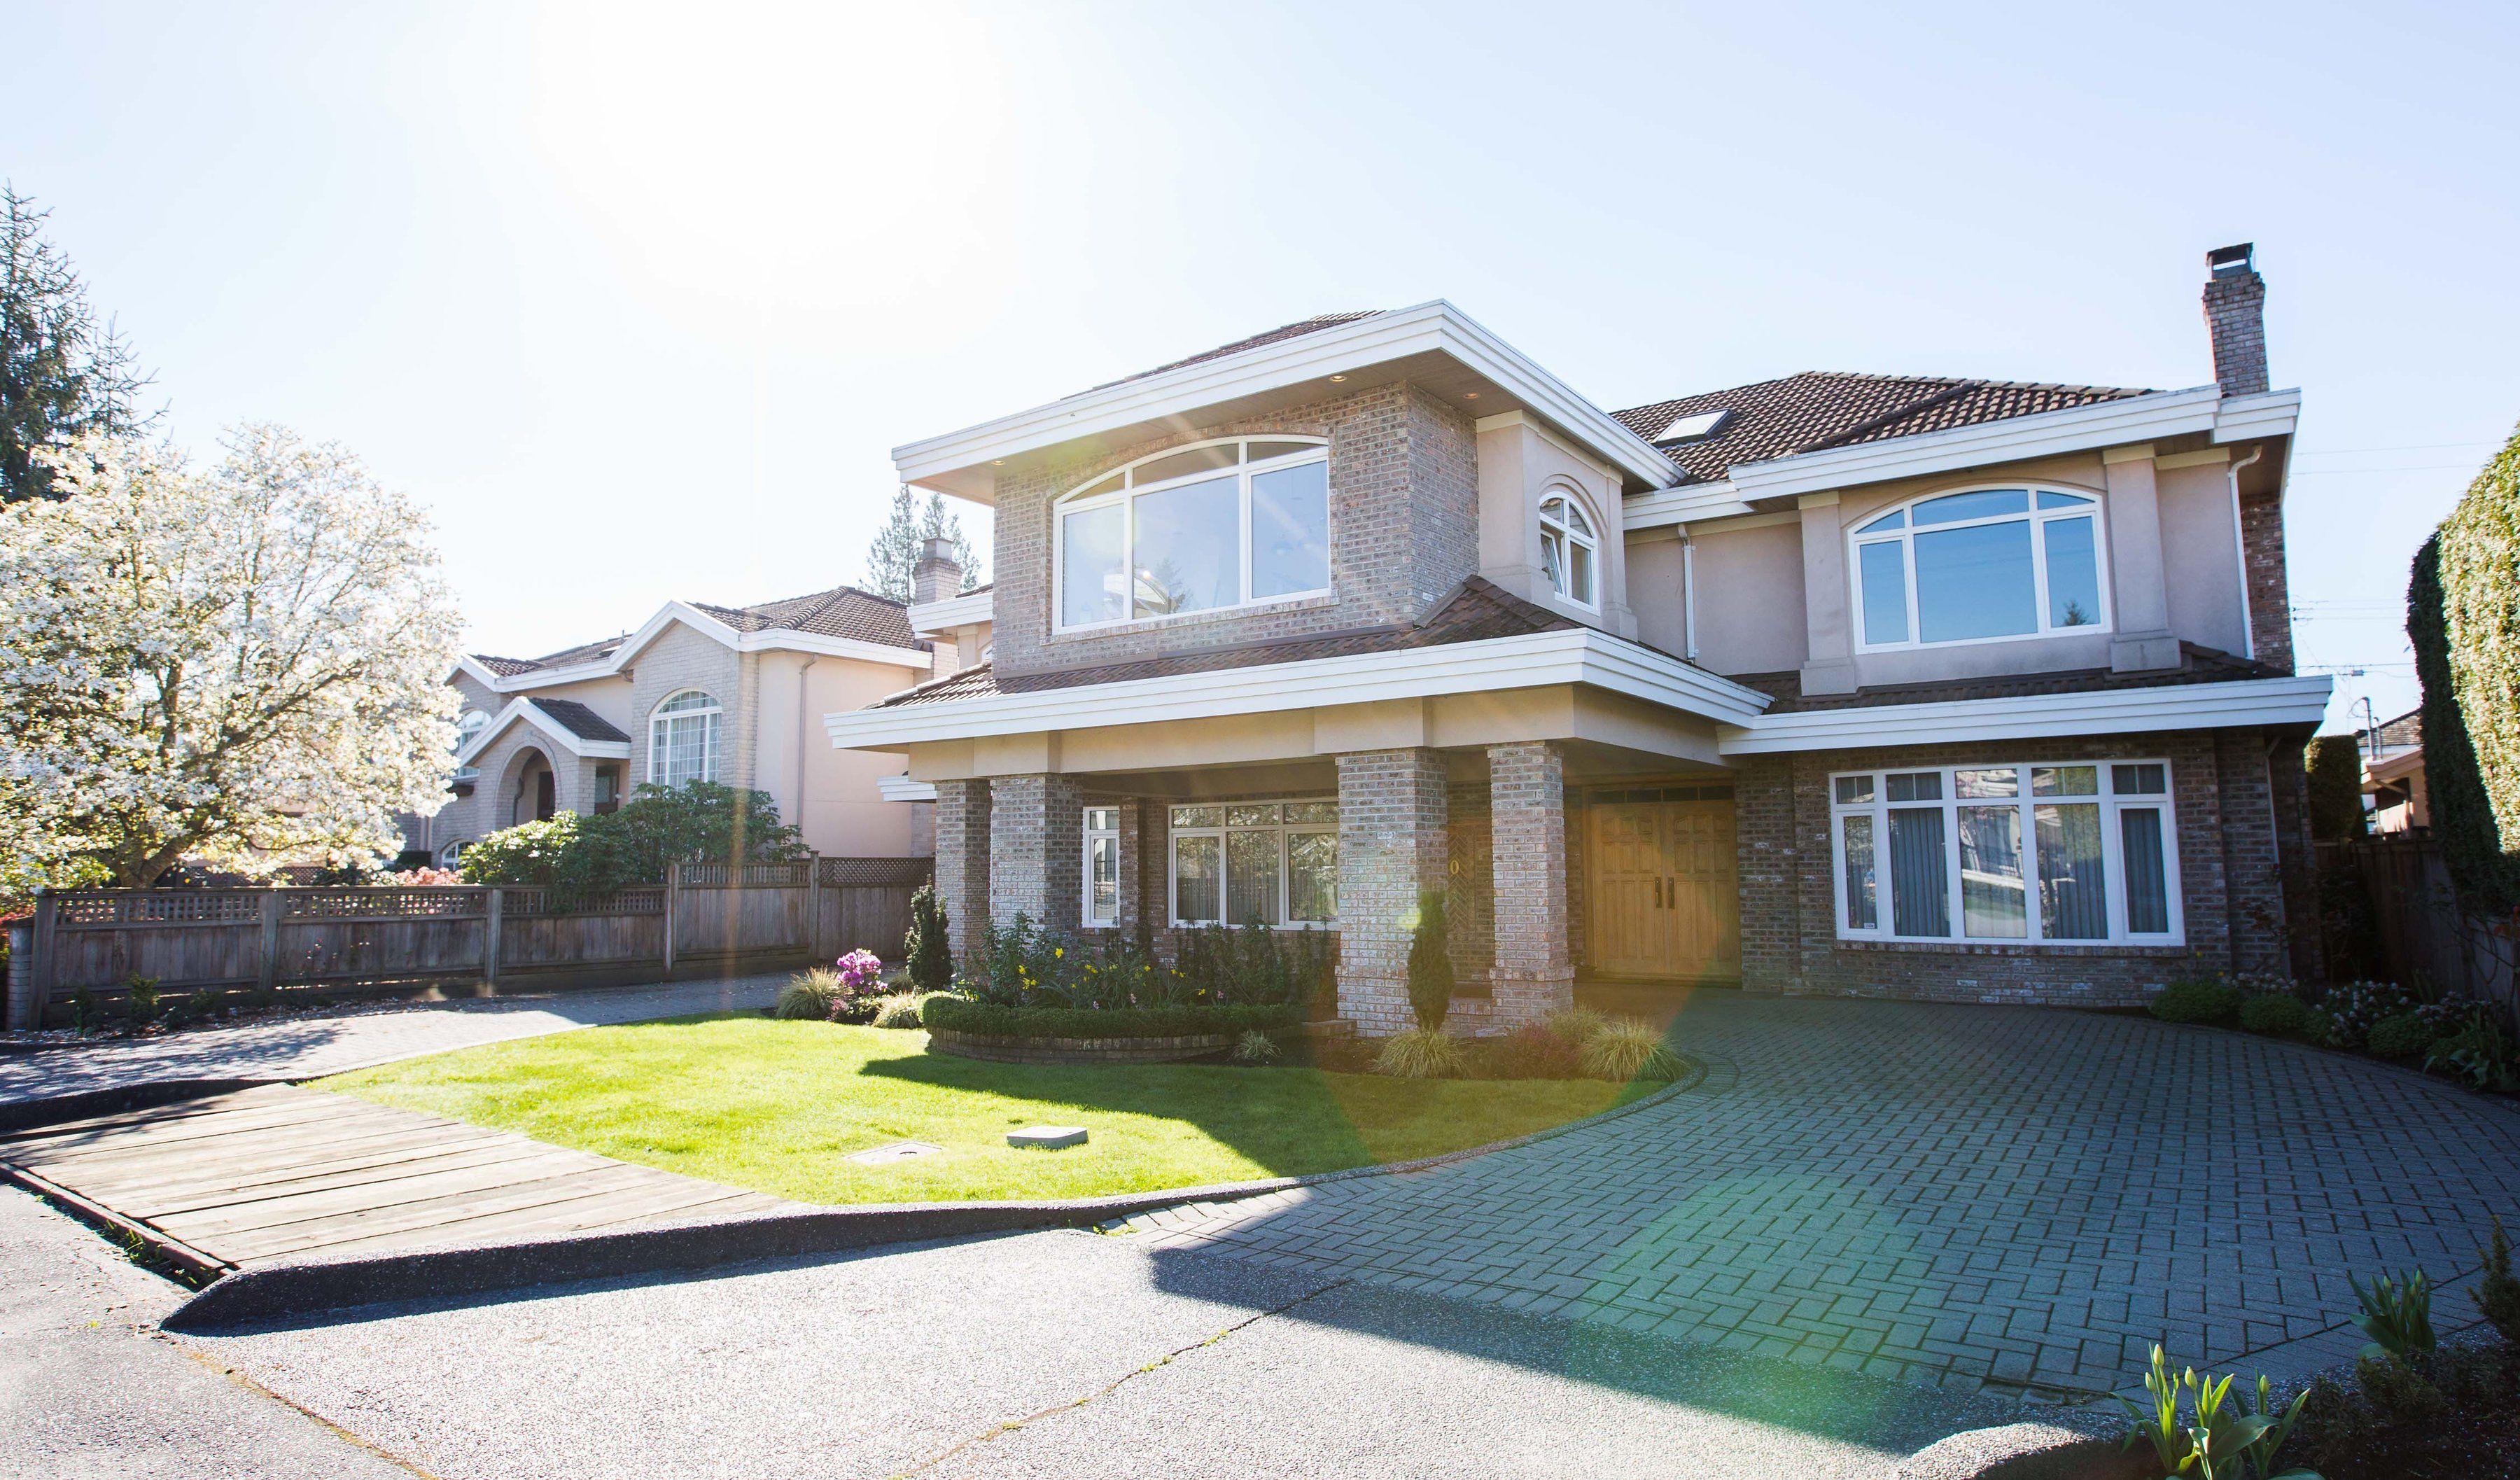 Main Photo: 7820 Broadmoor Boulevard: Broadmoor Home for sale ()  : MLS®# R2051613